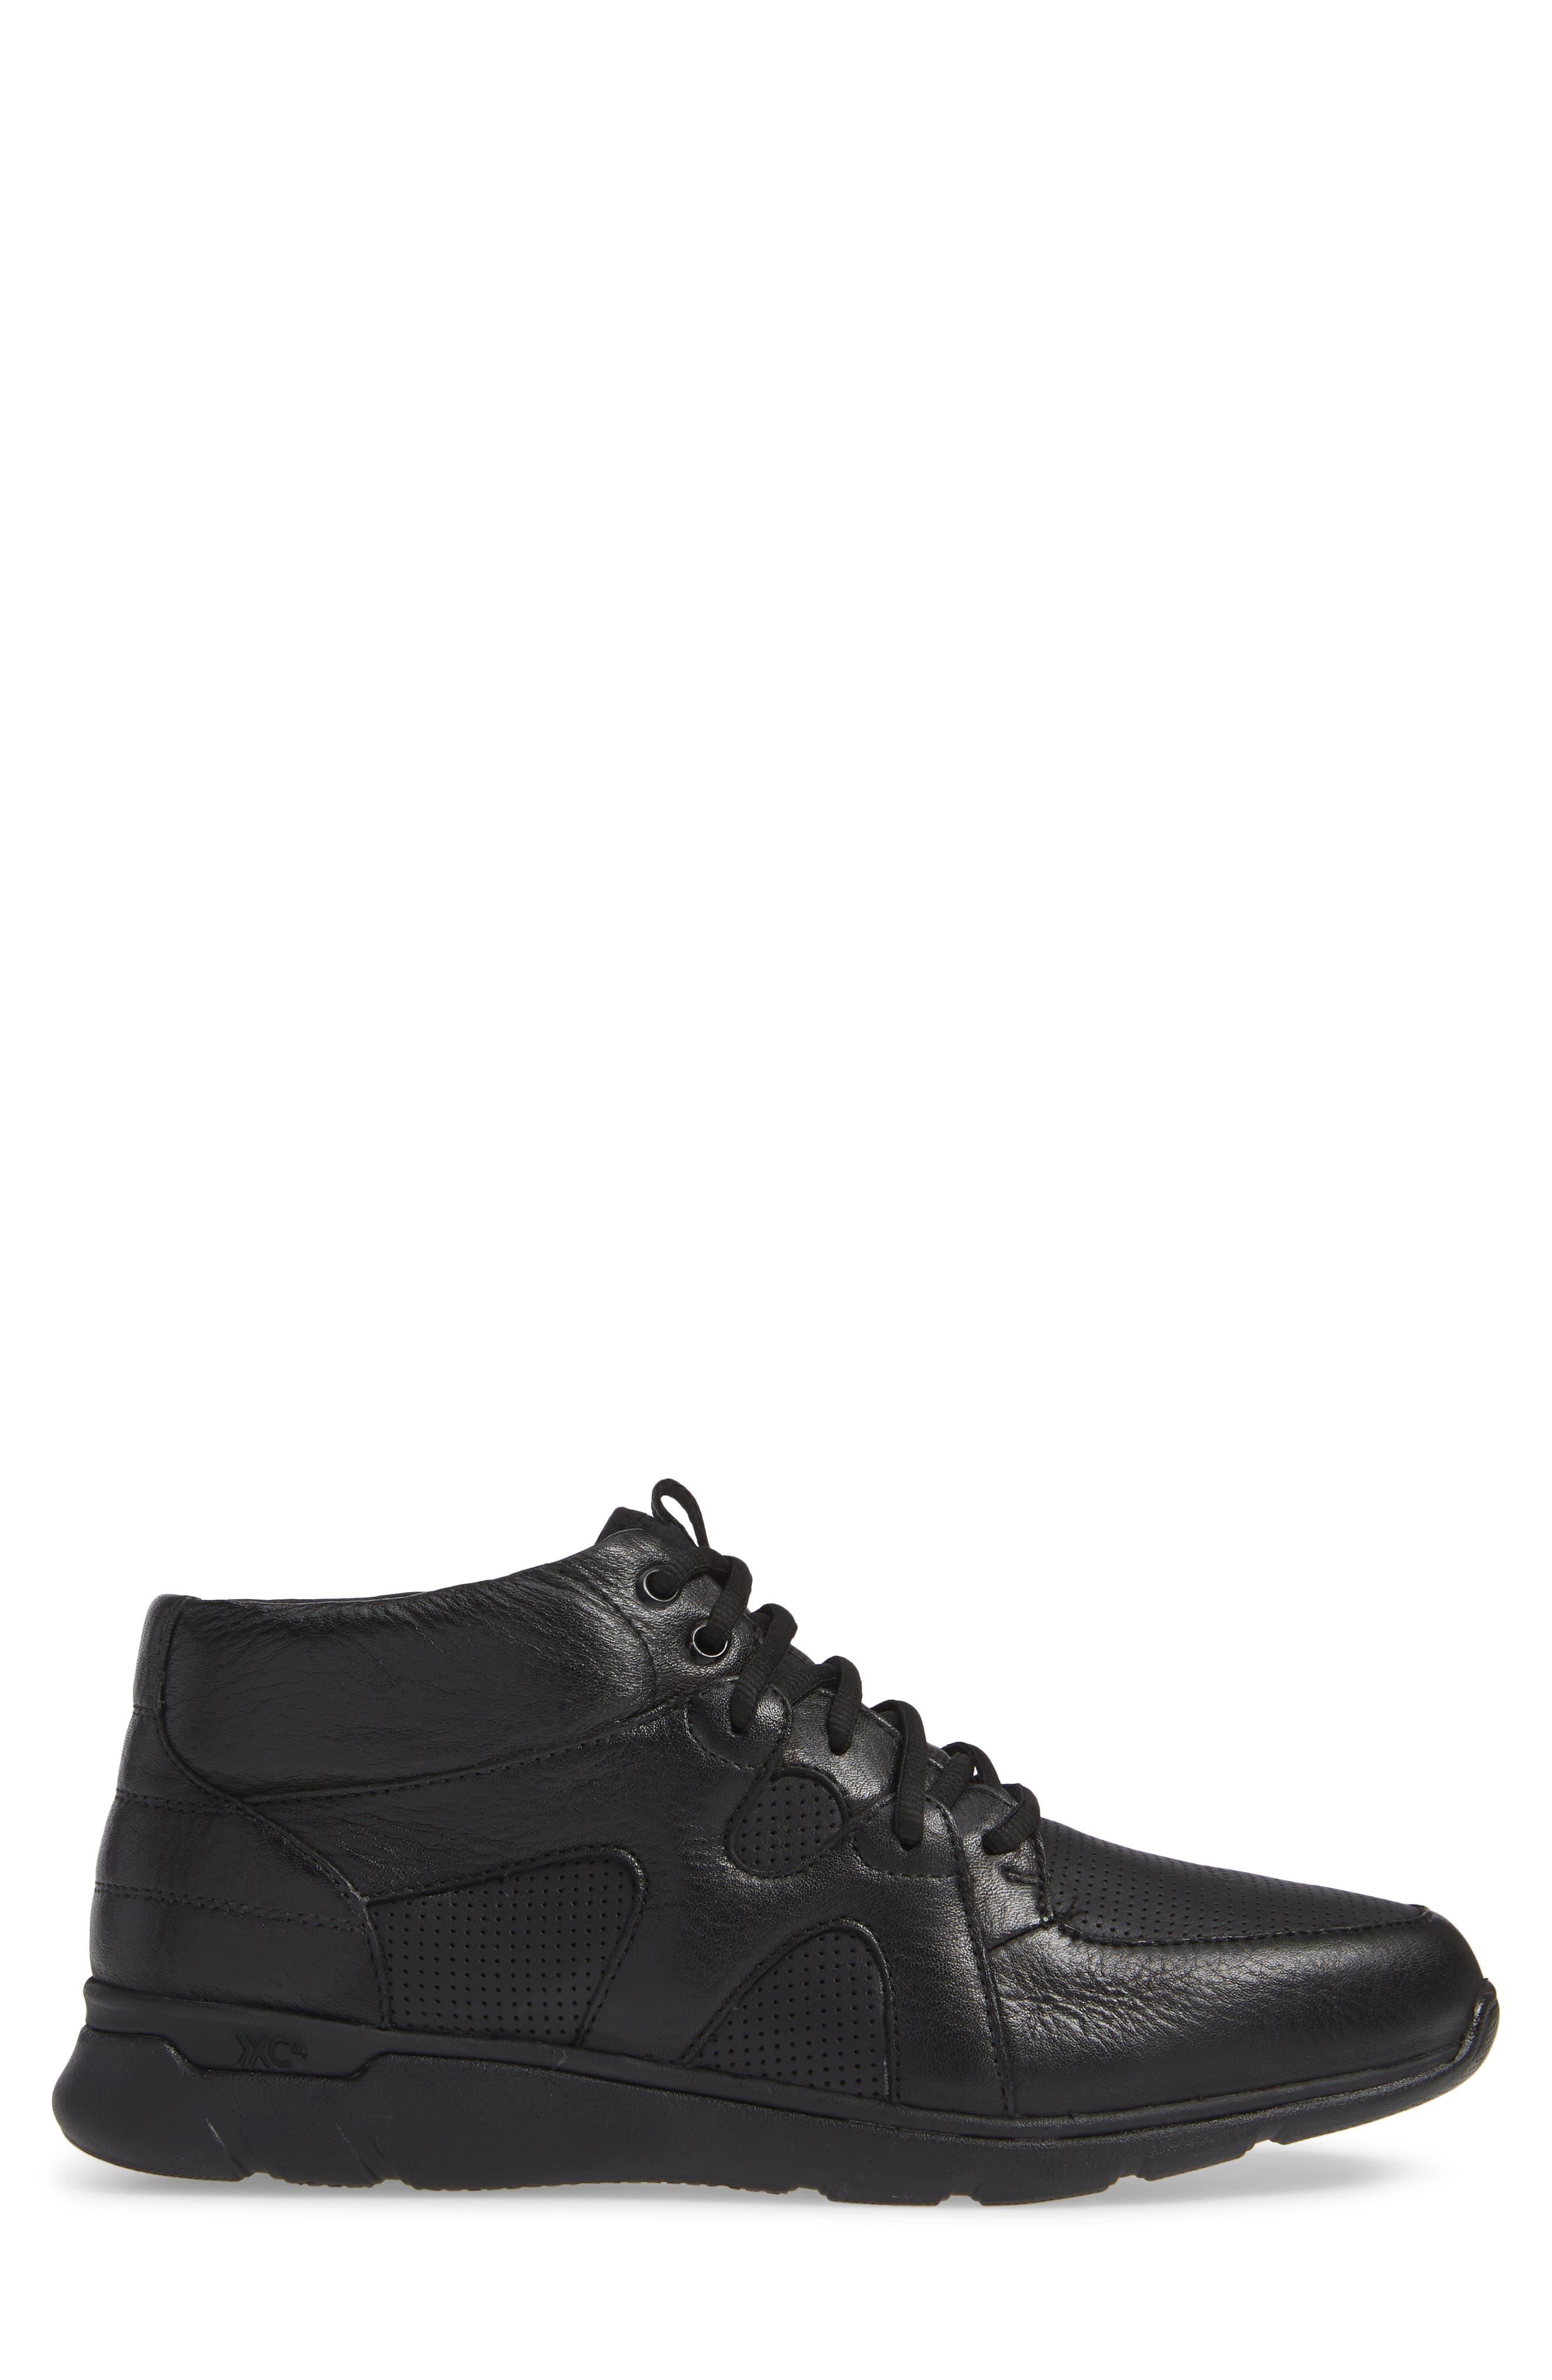 Prentiss Waterproof Sneaker,                             Alternate thumbnail 3, color,                             BLACK LEATHER